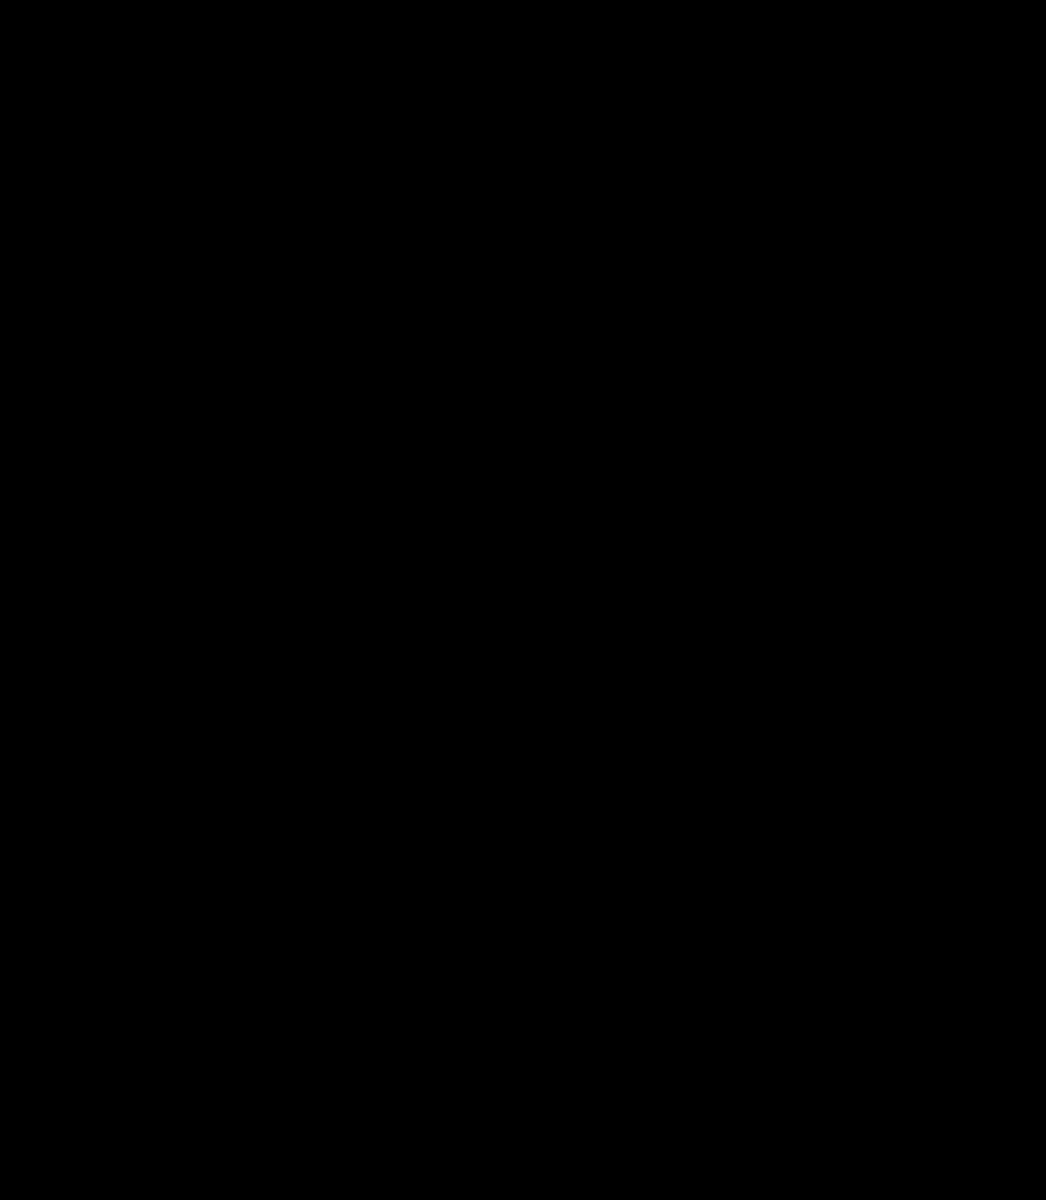 espada y escudo_silueta_vectorized